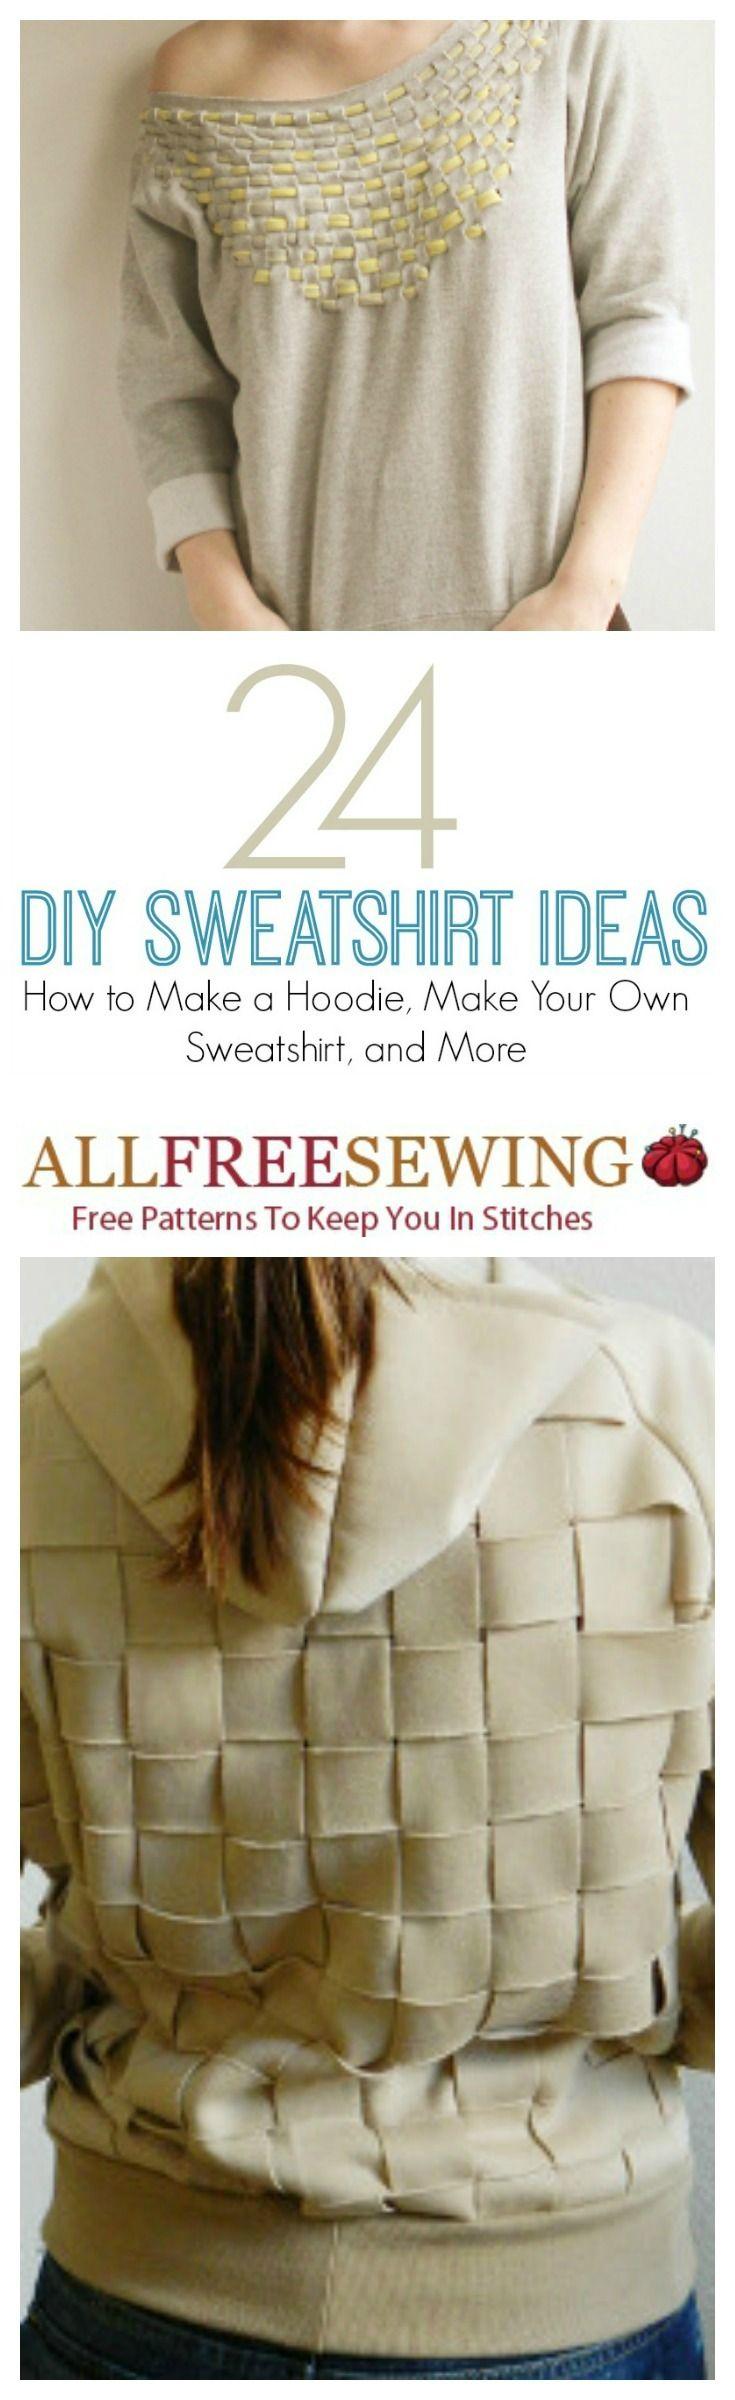 Diy Sweatshirt Ideas 36 Sweatshirt Patterns Sweatshirt Dress Diy Diy Sweatshirt Make Your Own Sweatshirt [ 2400 x 735 Pixel ]